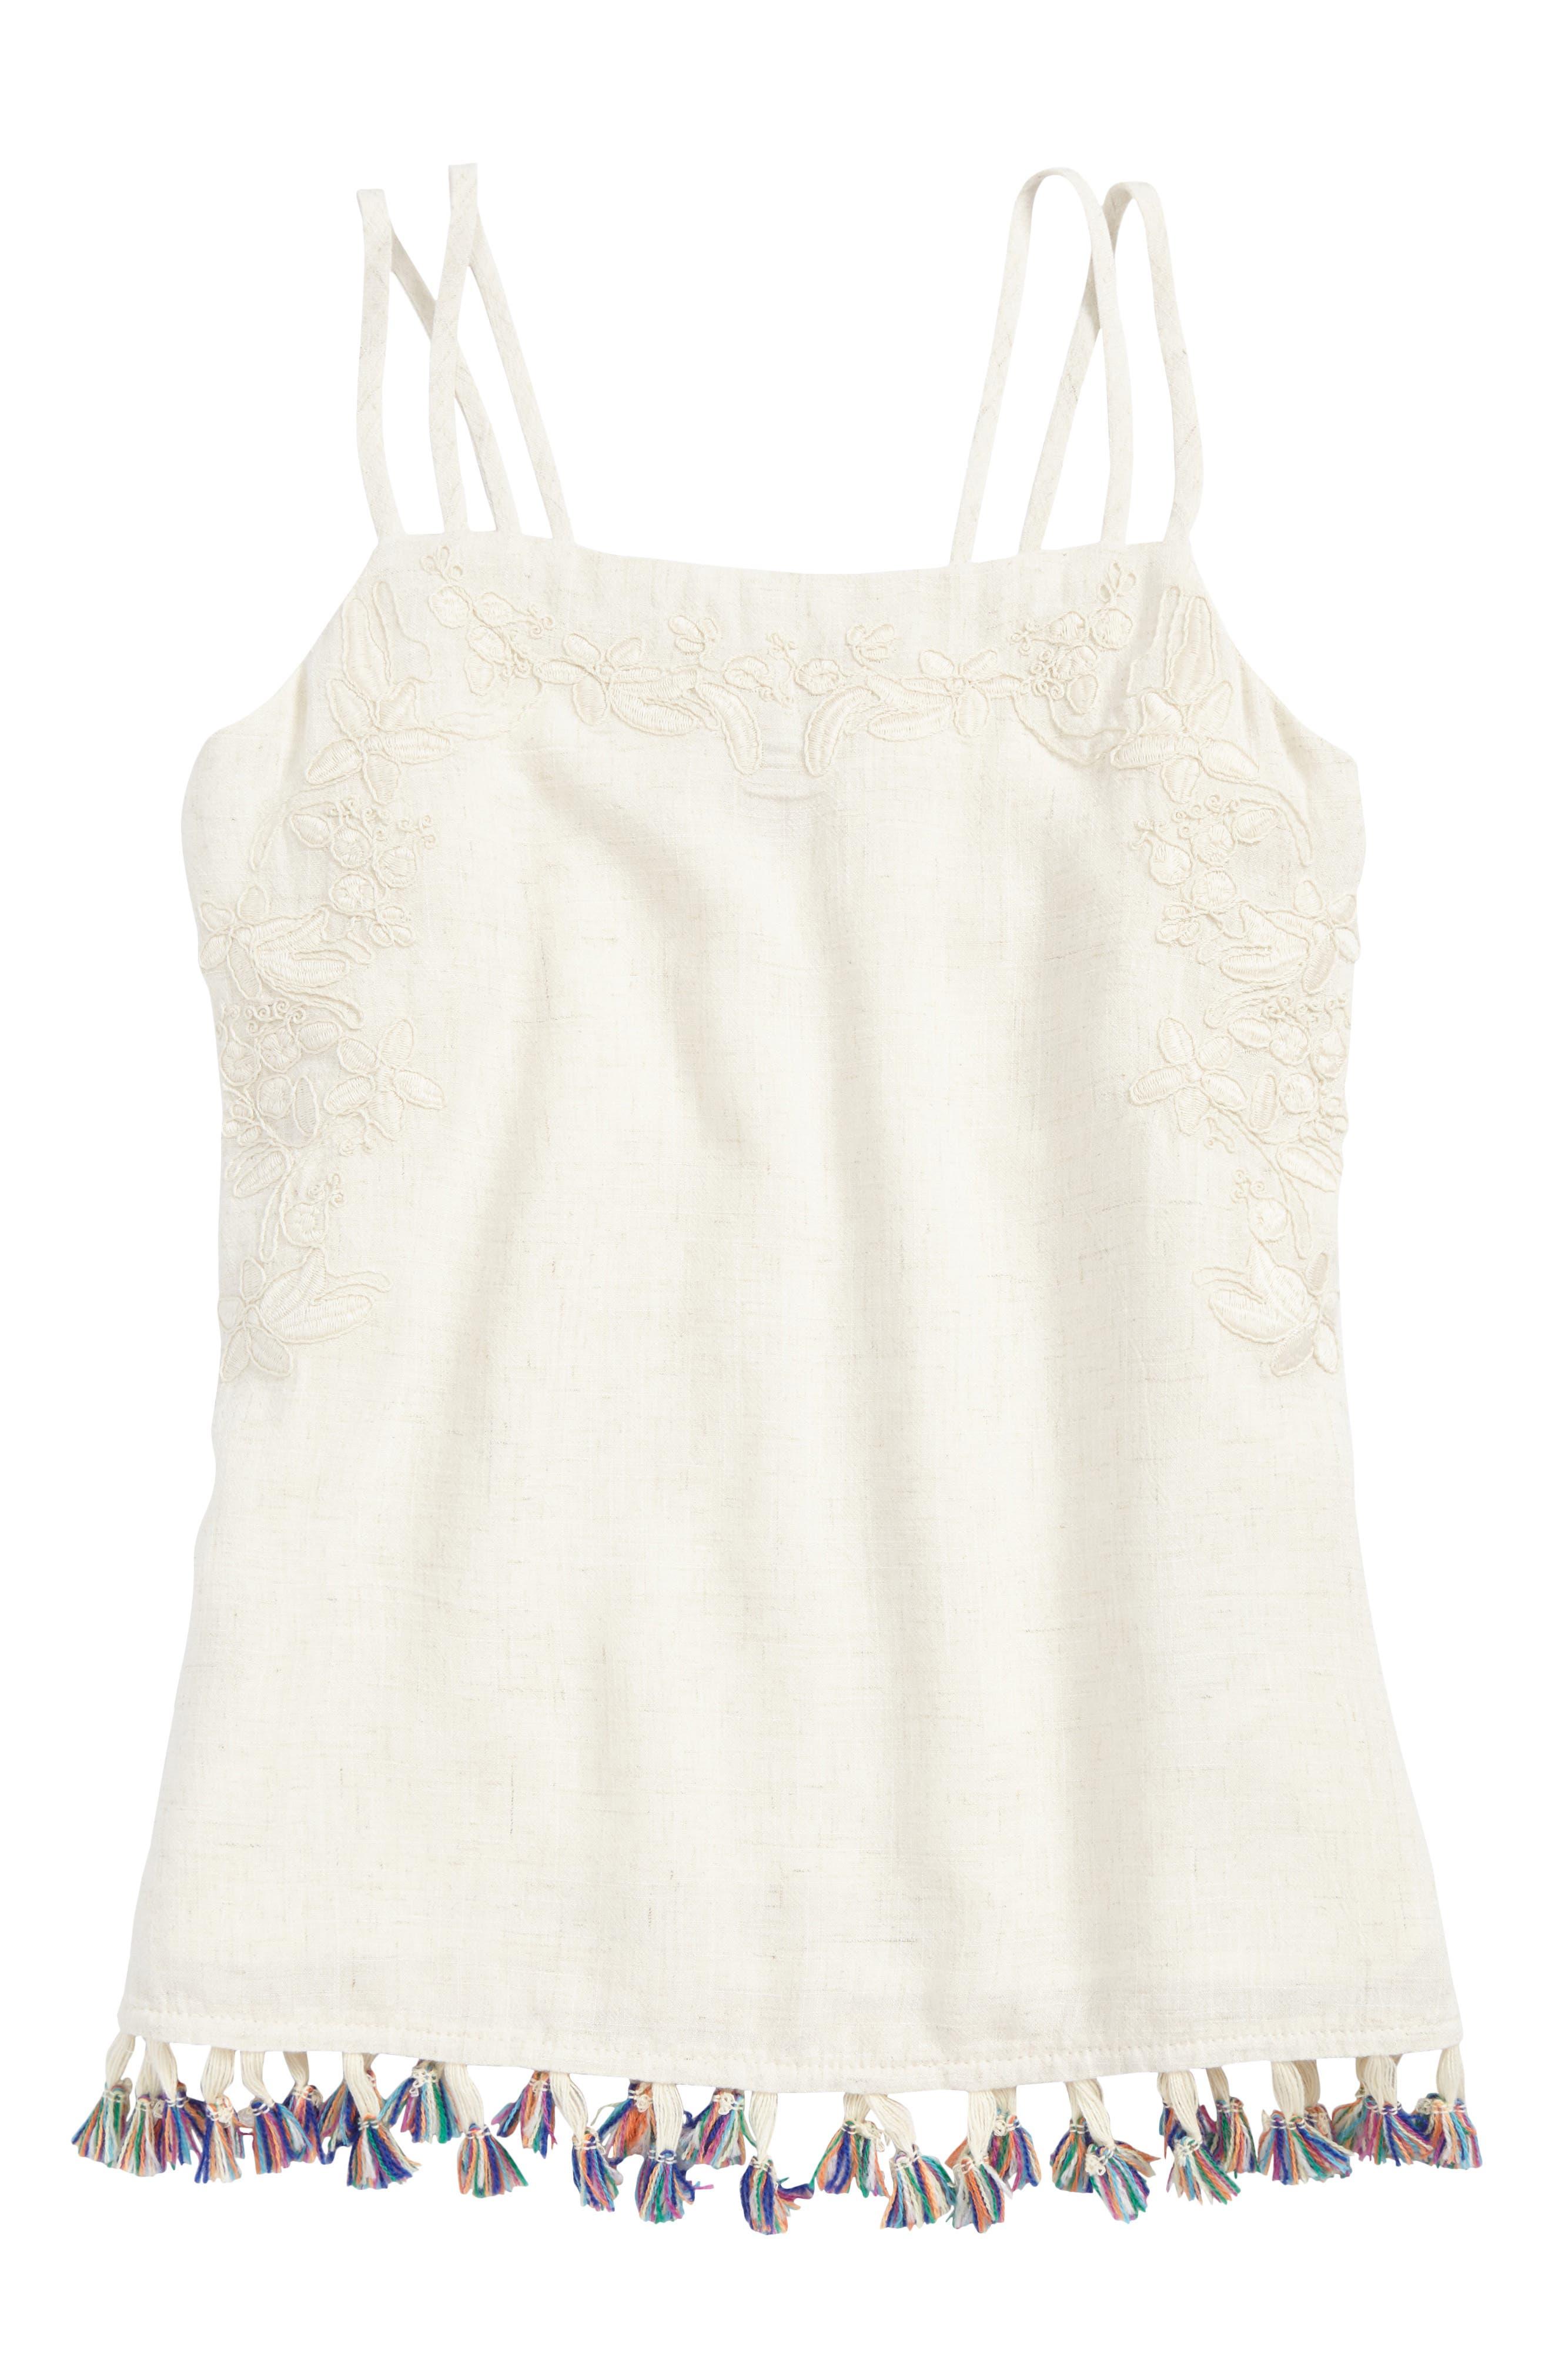 Alternate Image 1 Selected - For All Seasons Embroidered Linen Tassel Tank (Big Girls)